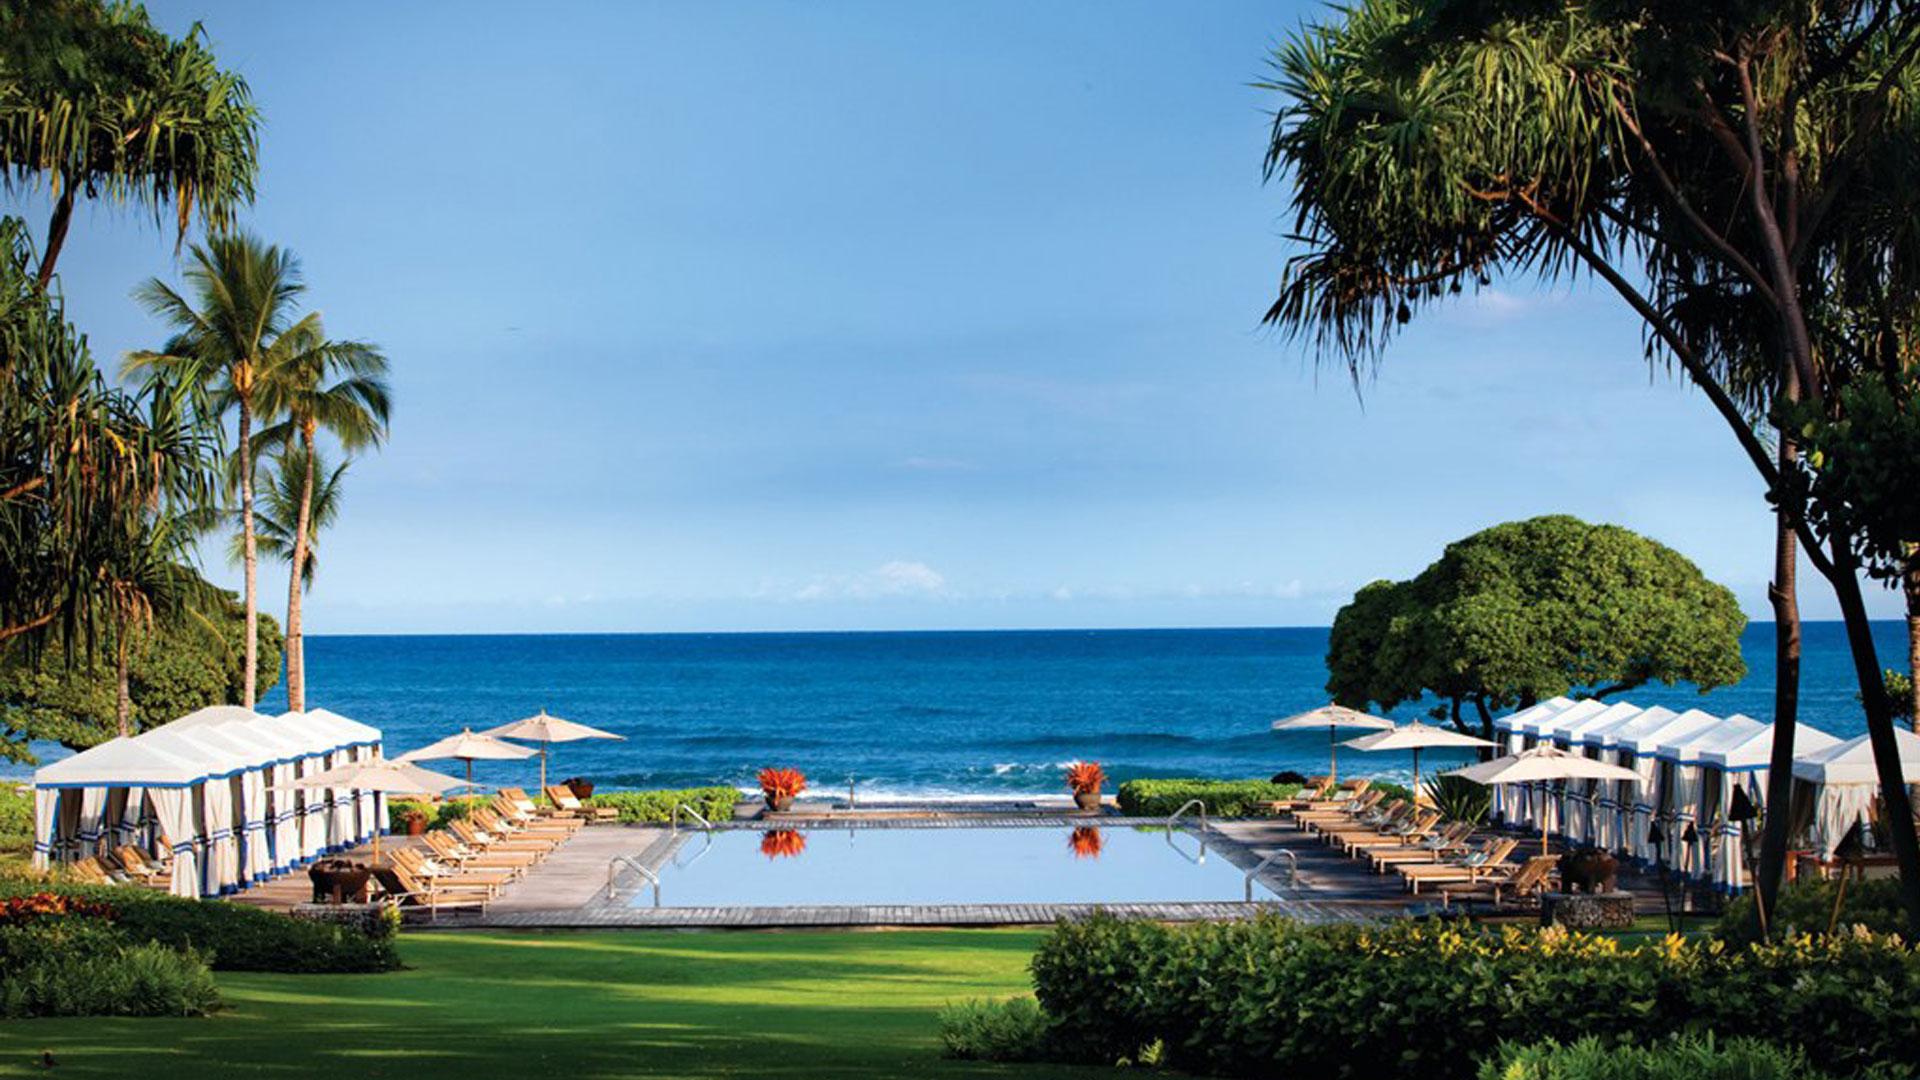 Big-Island-tourism-Hawaii1.jpg